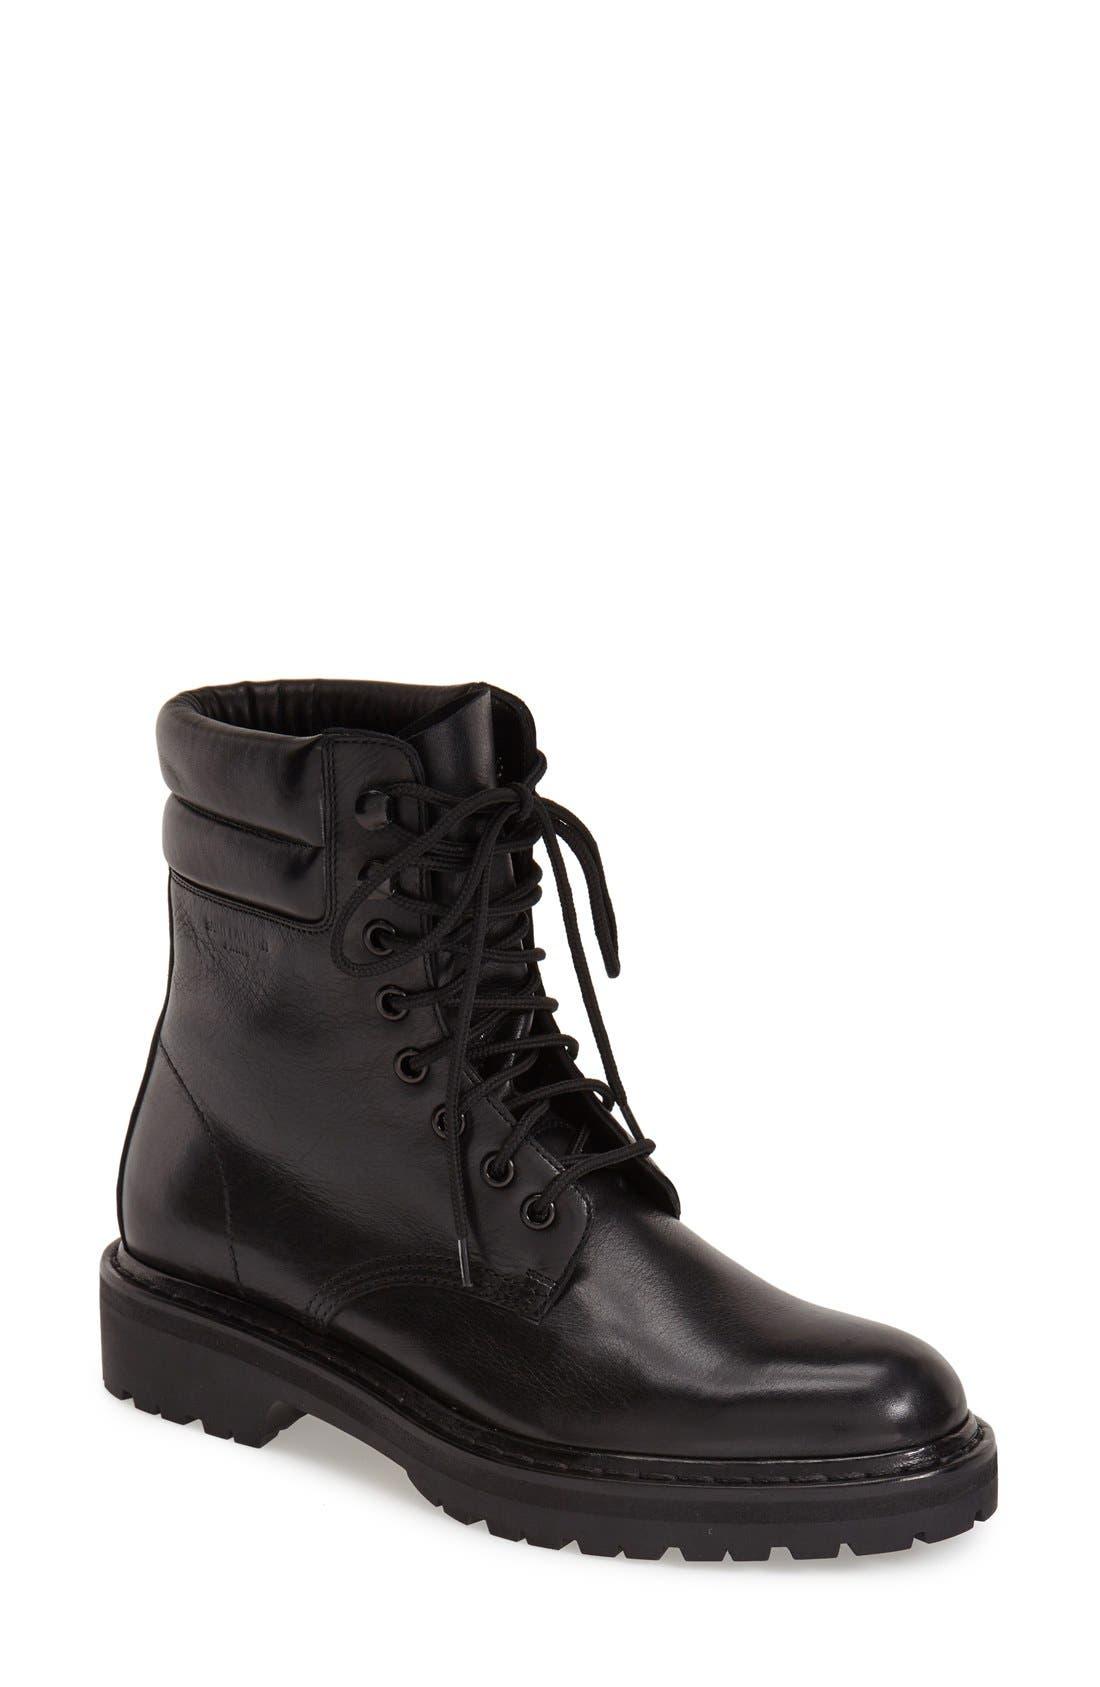 Main Image - Saint Laurent 'Army' Lace-Up Boot (Women)